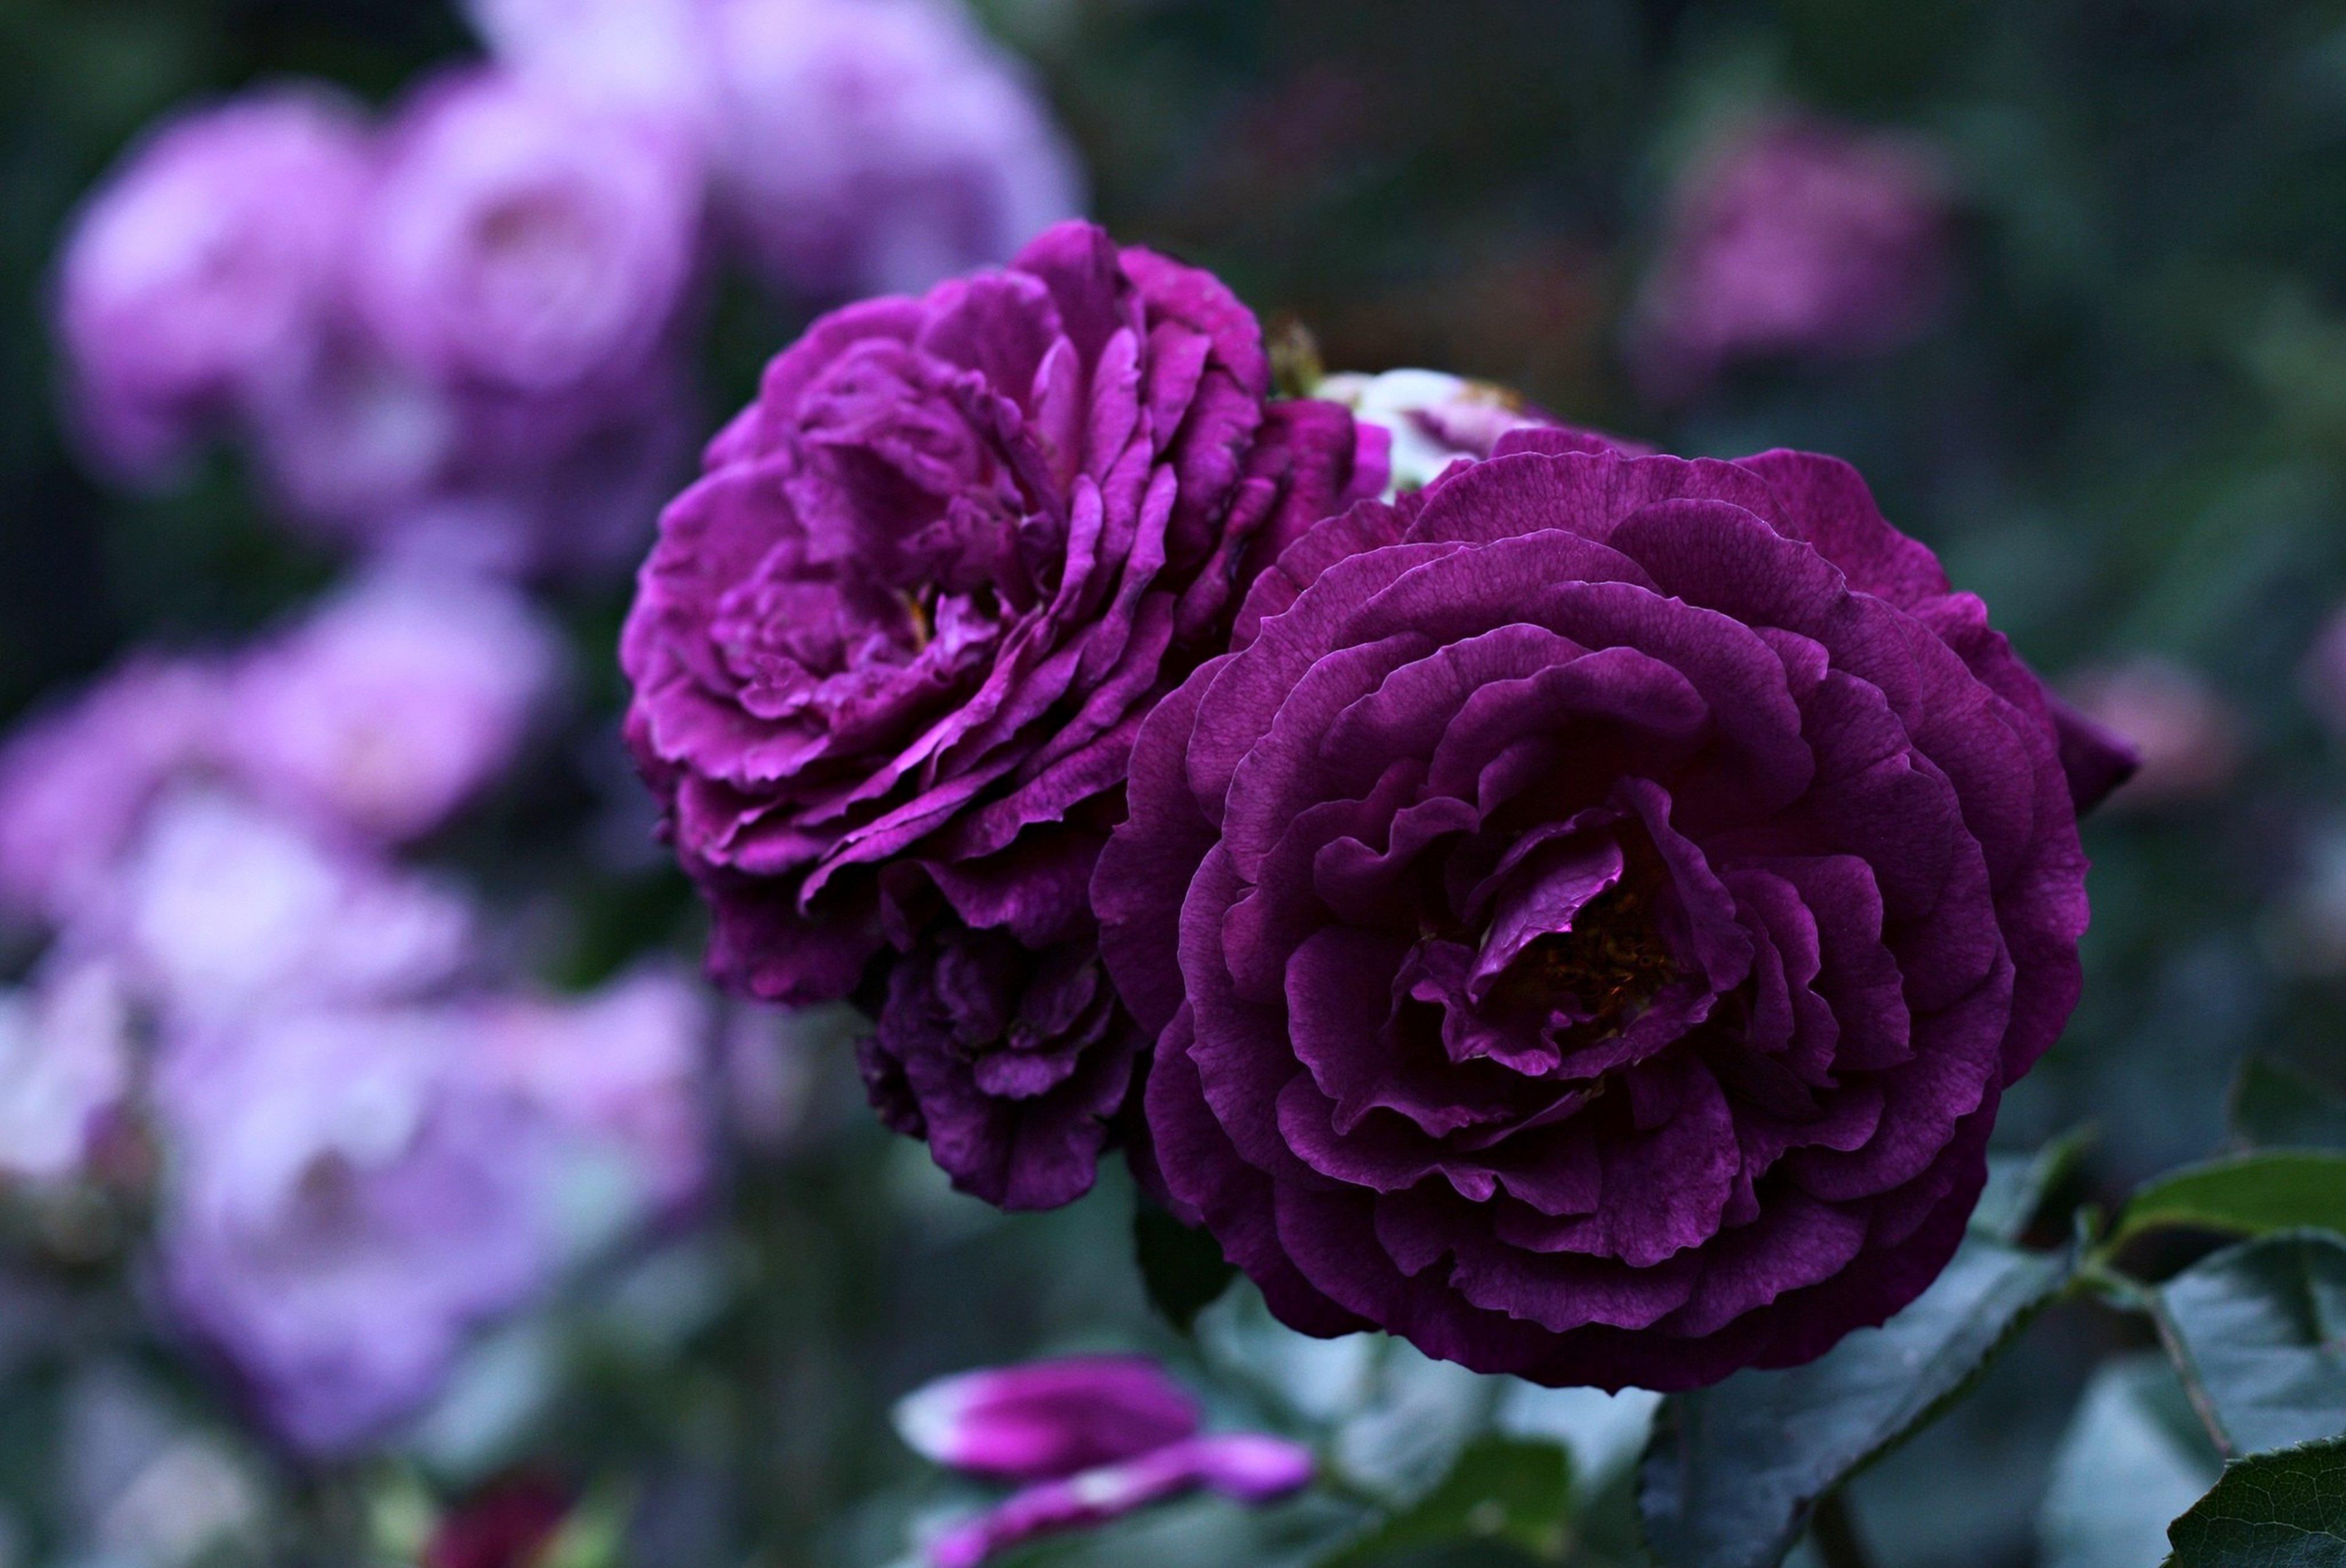 flower life love rose purple violet wallpaper